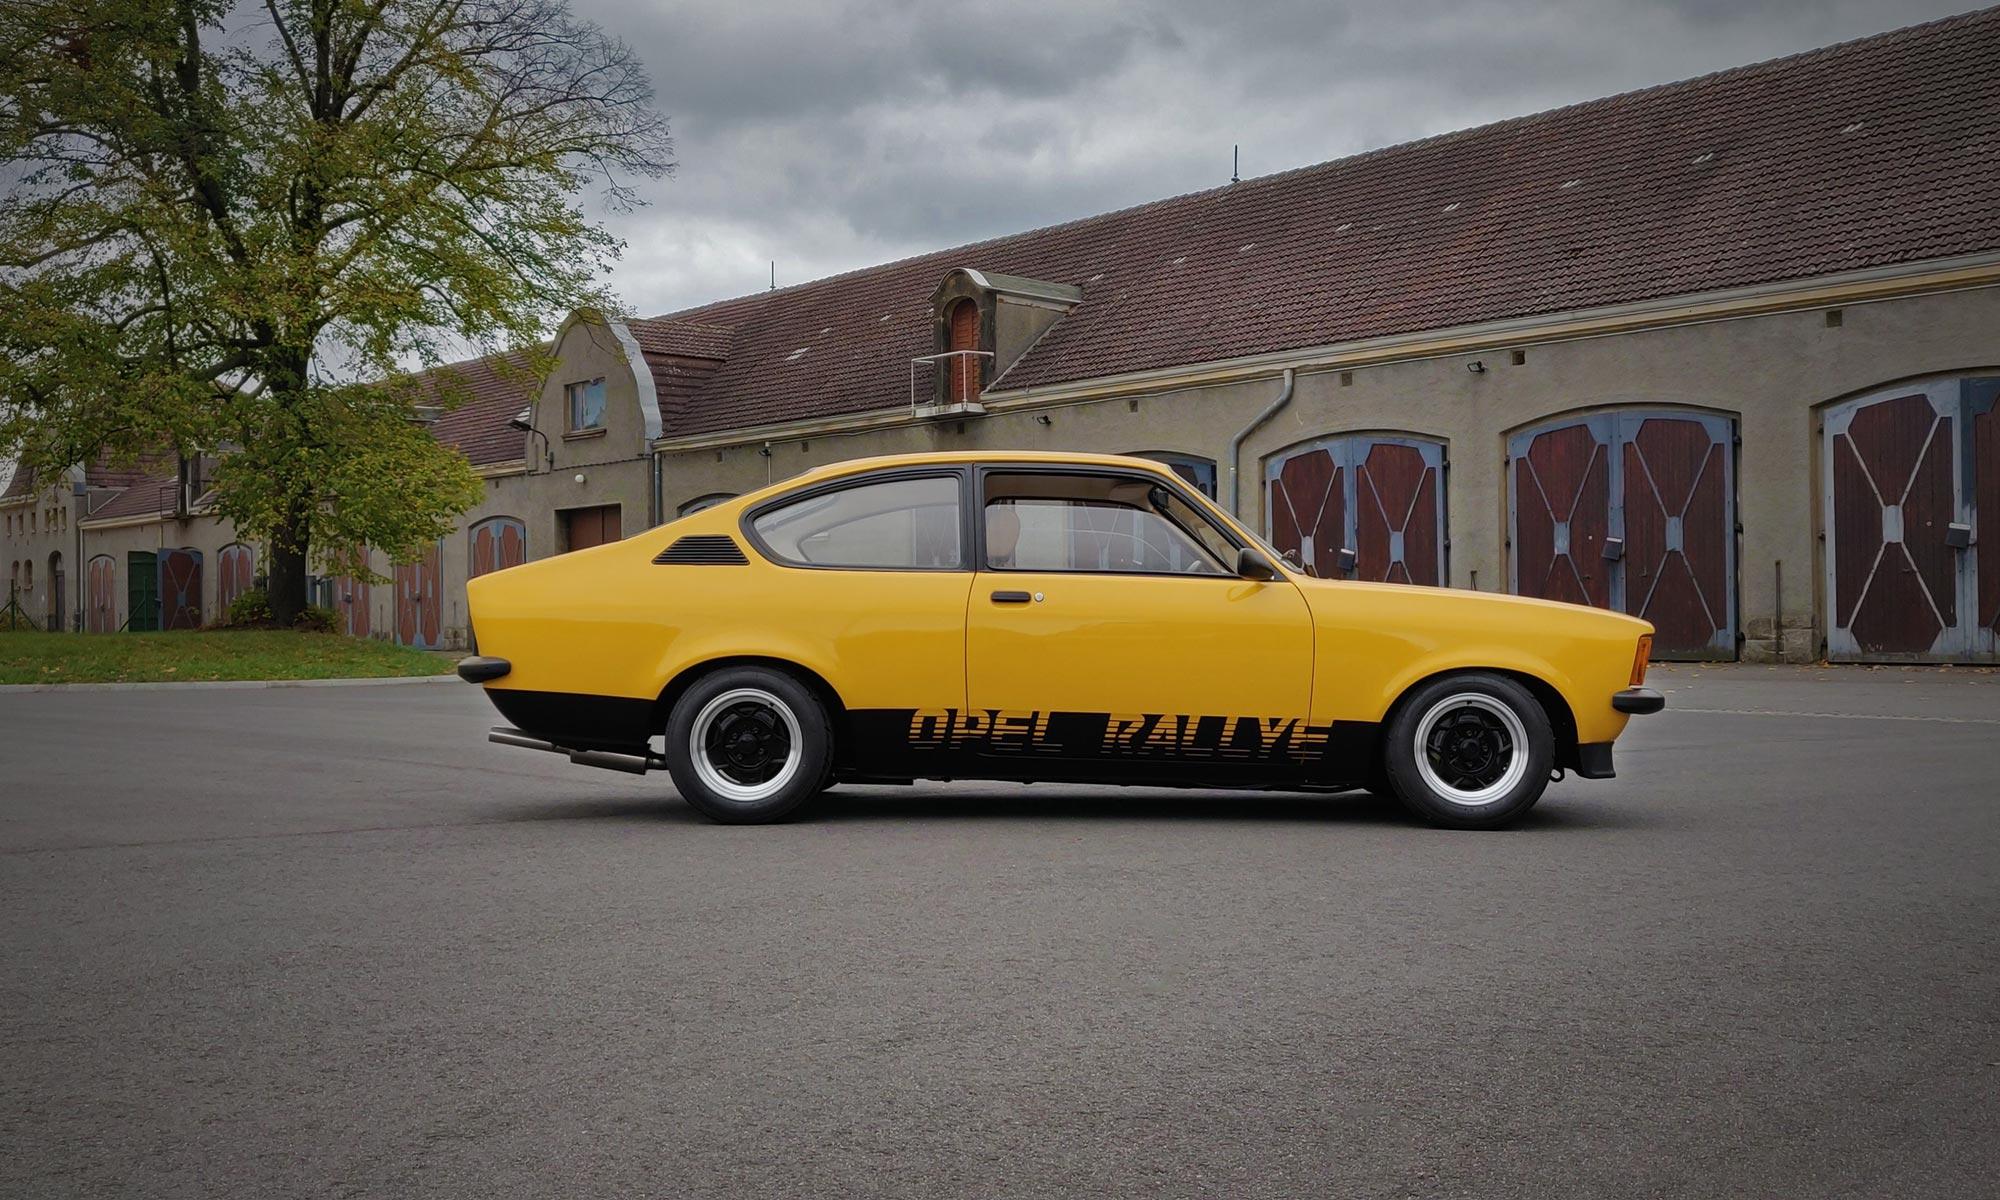 4R1B - Opel Kadett C